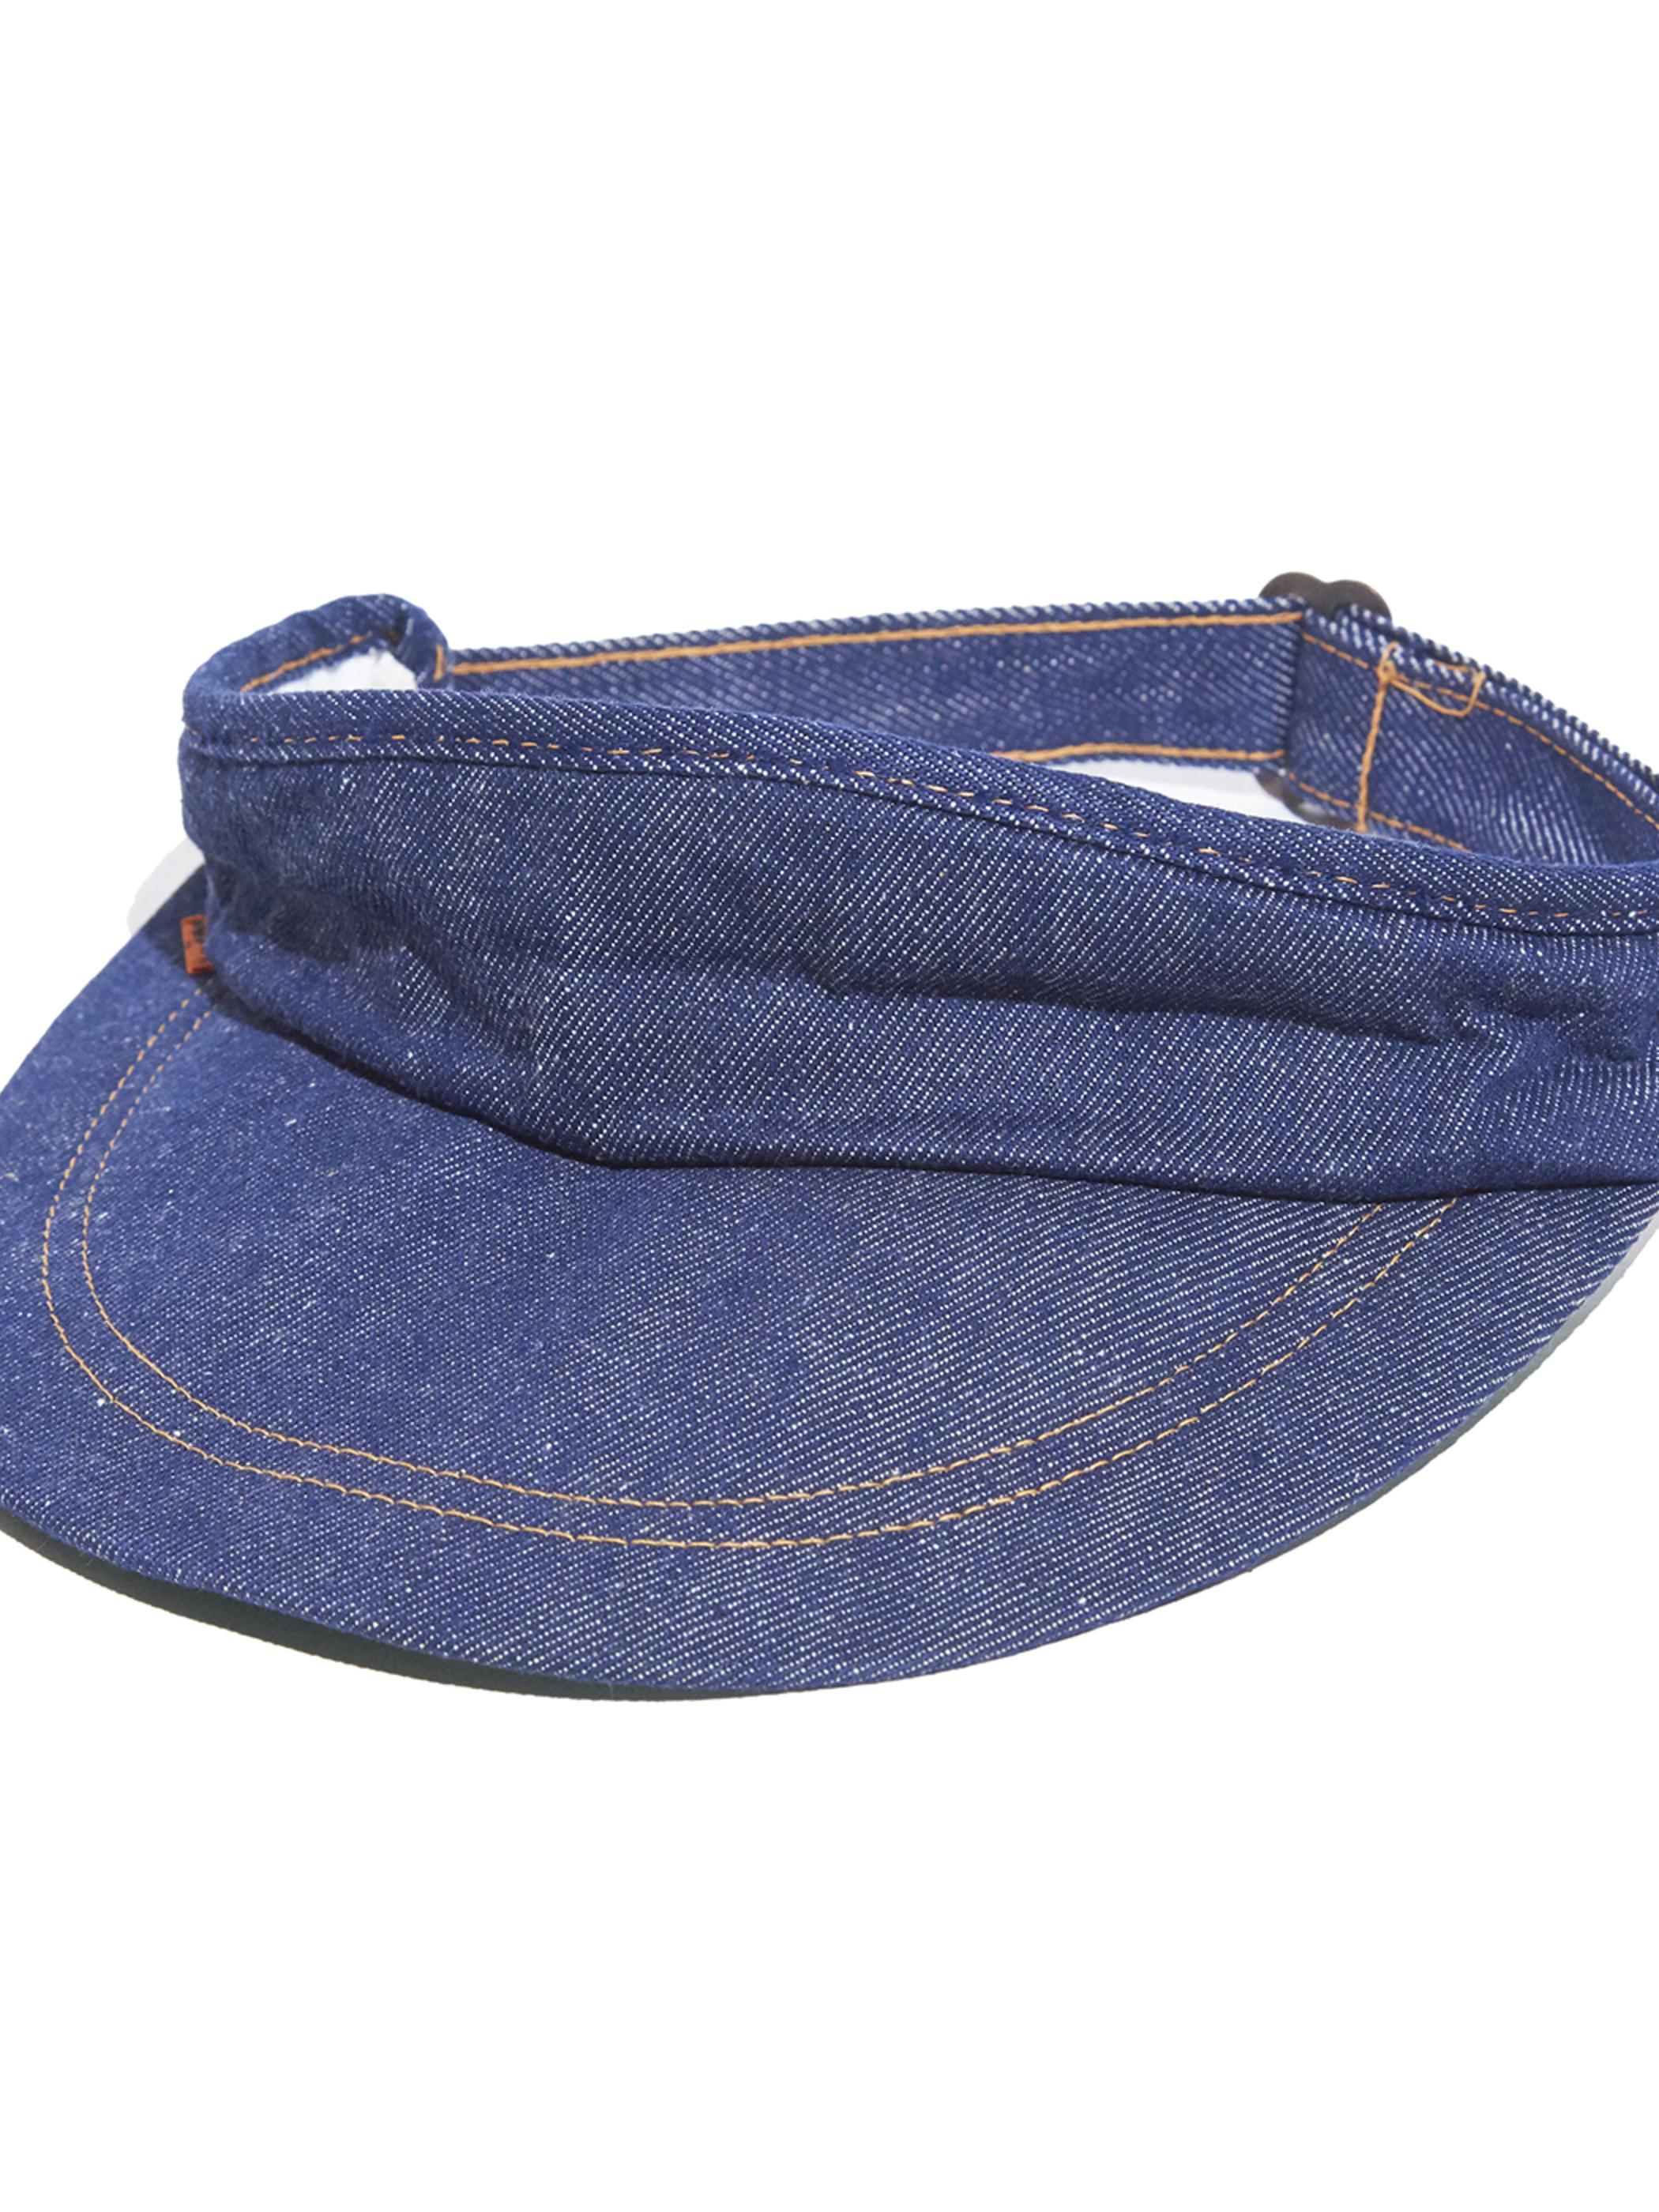 "1970s ""Levi's"" denim sun visor -INDIGO-"